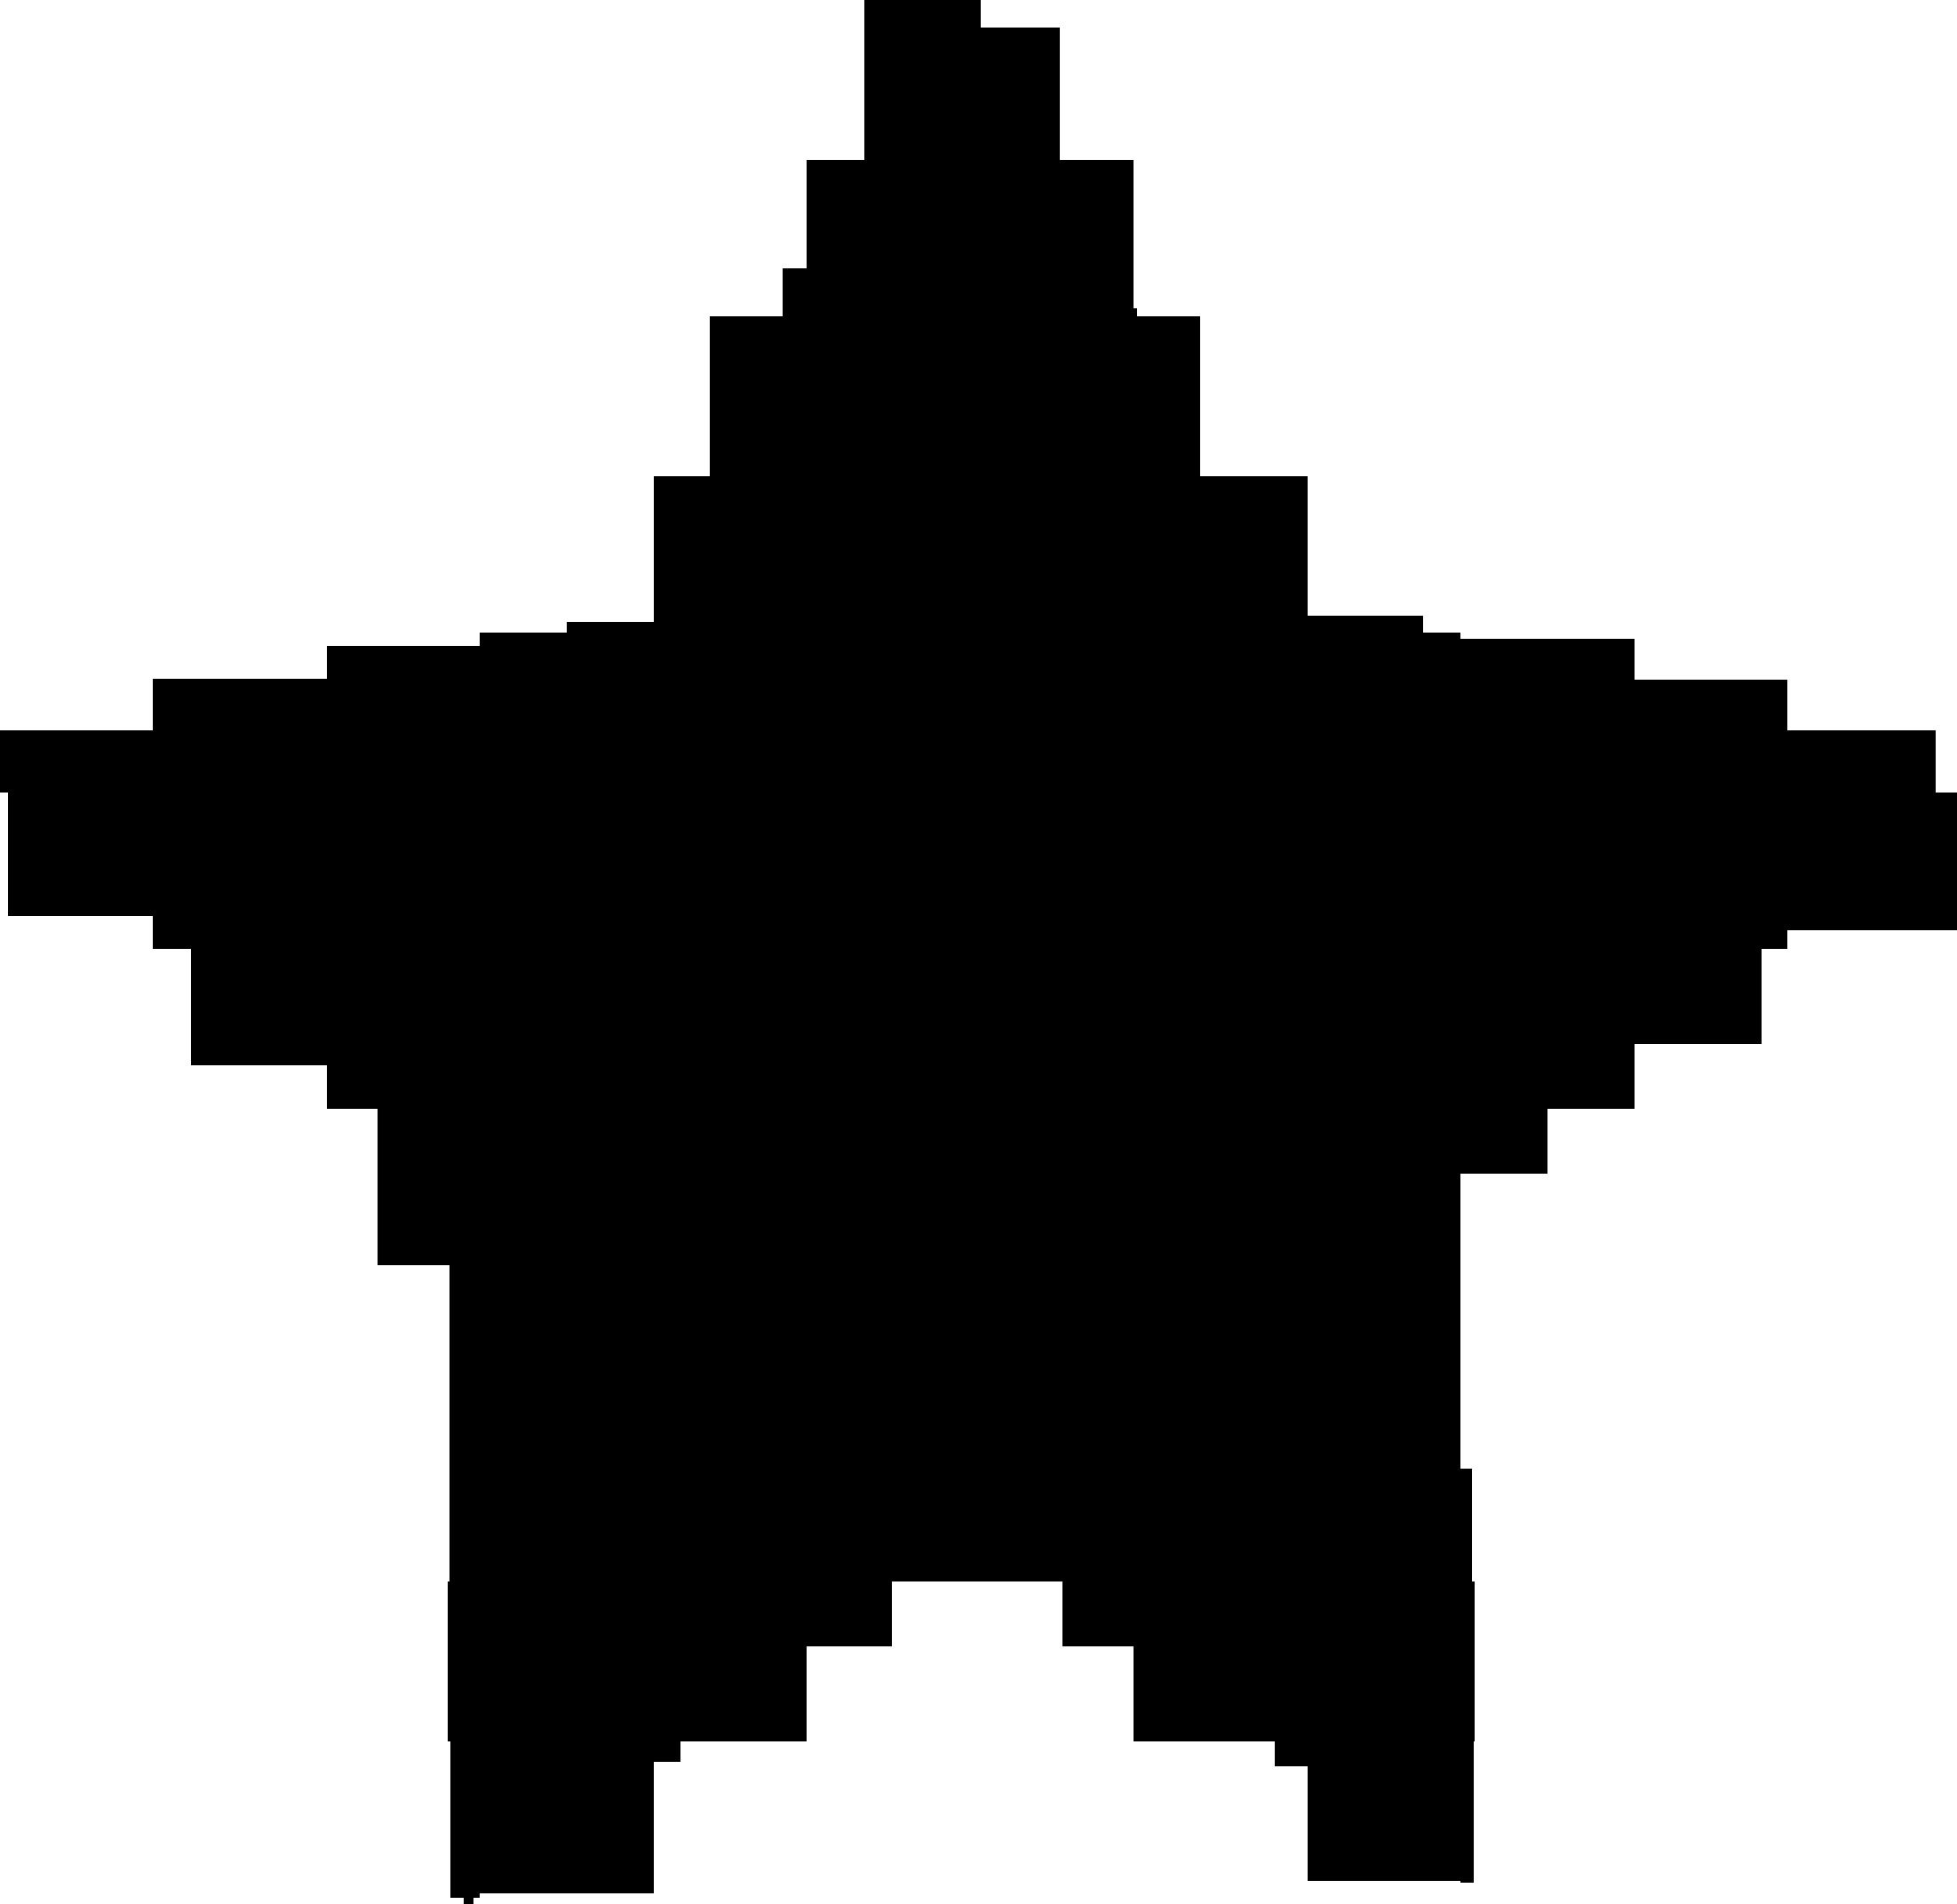 Еврокино (мини)